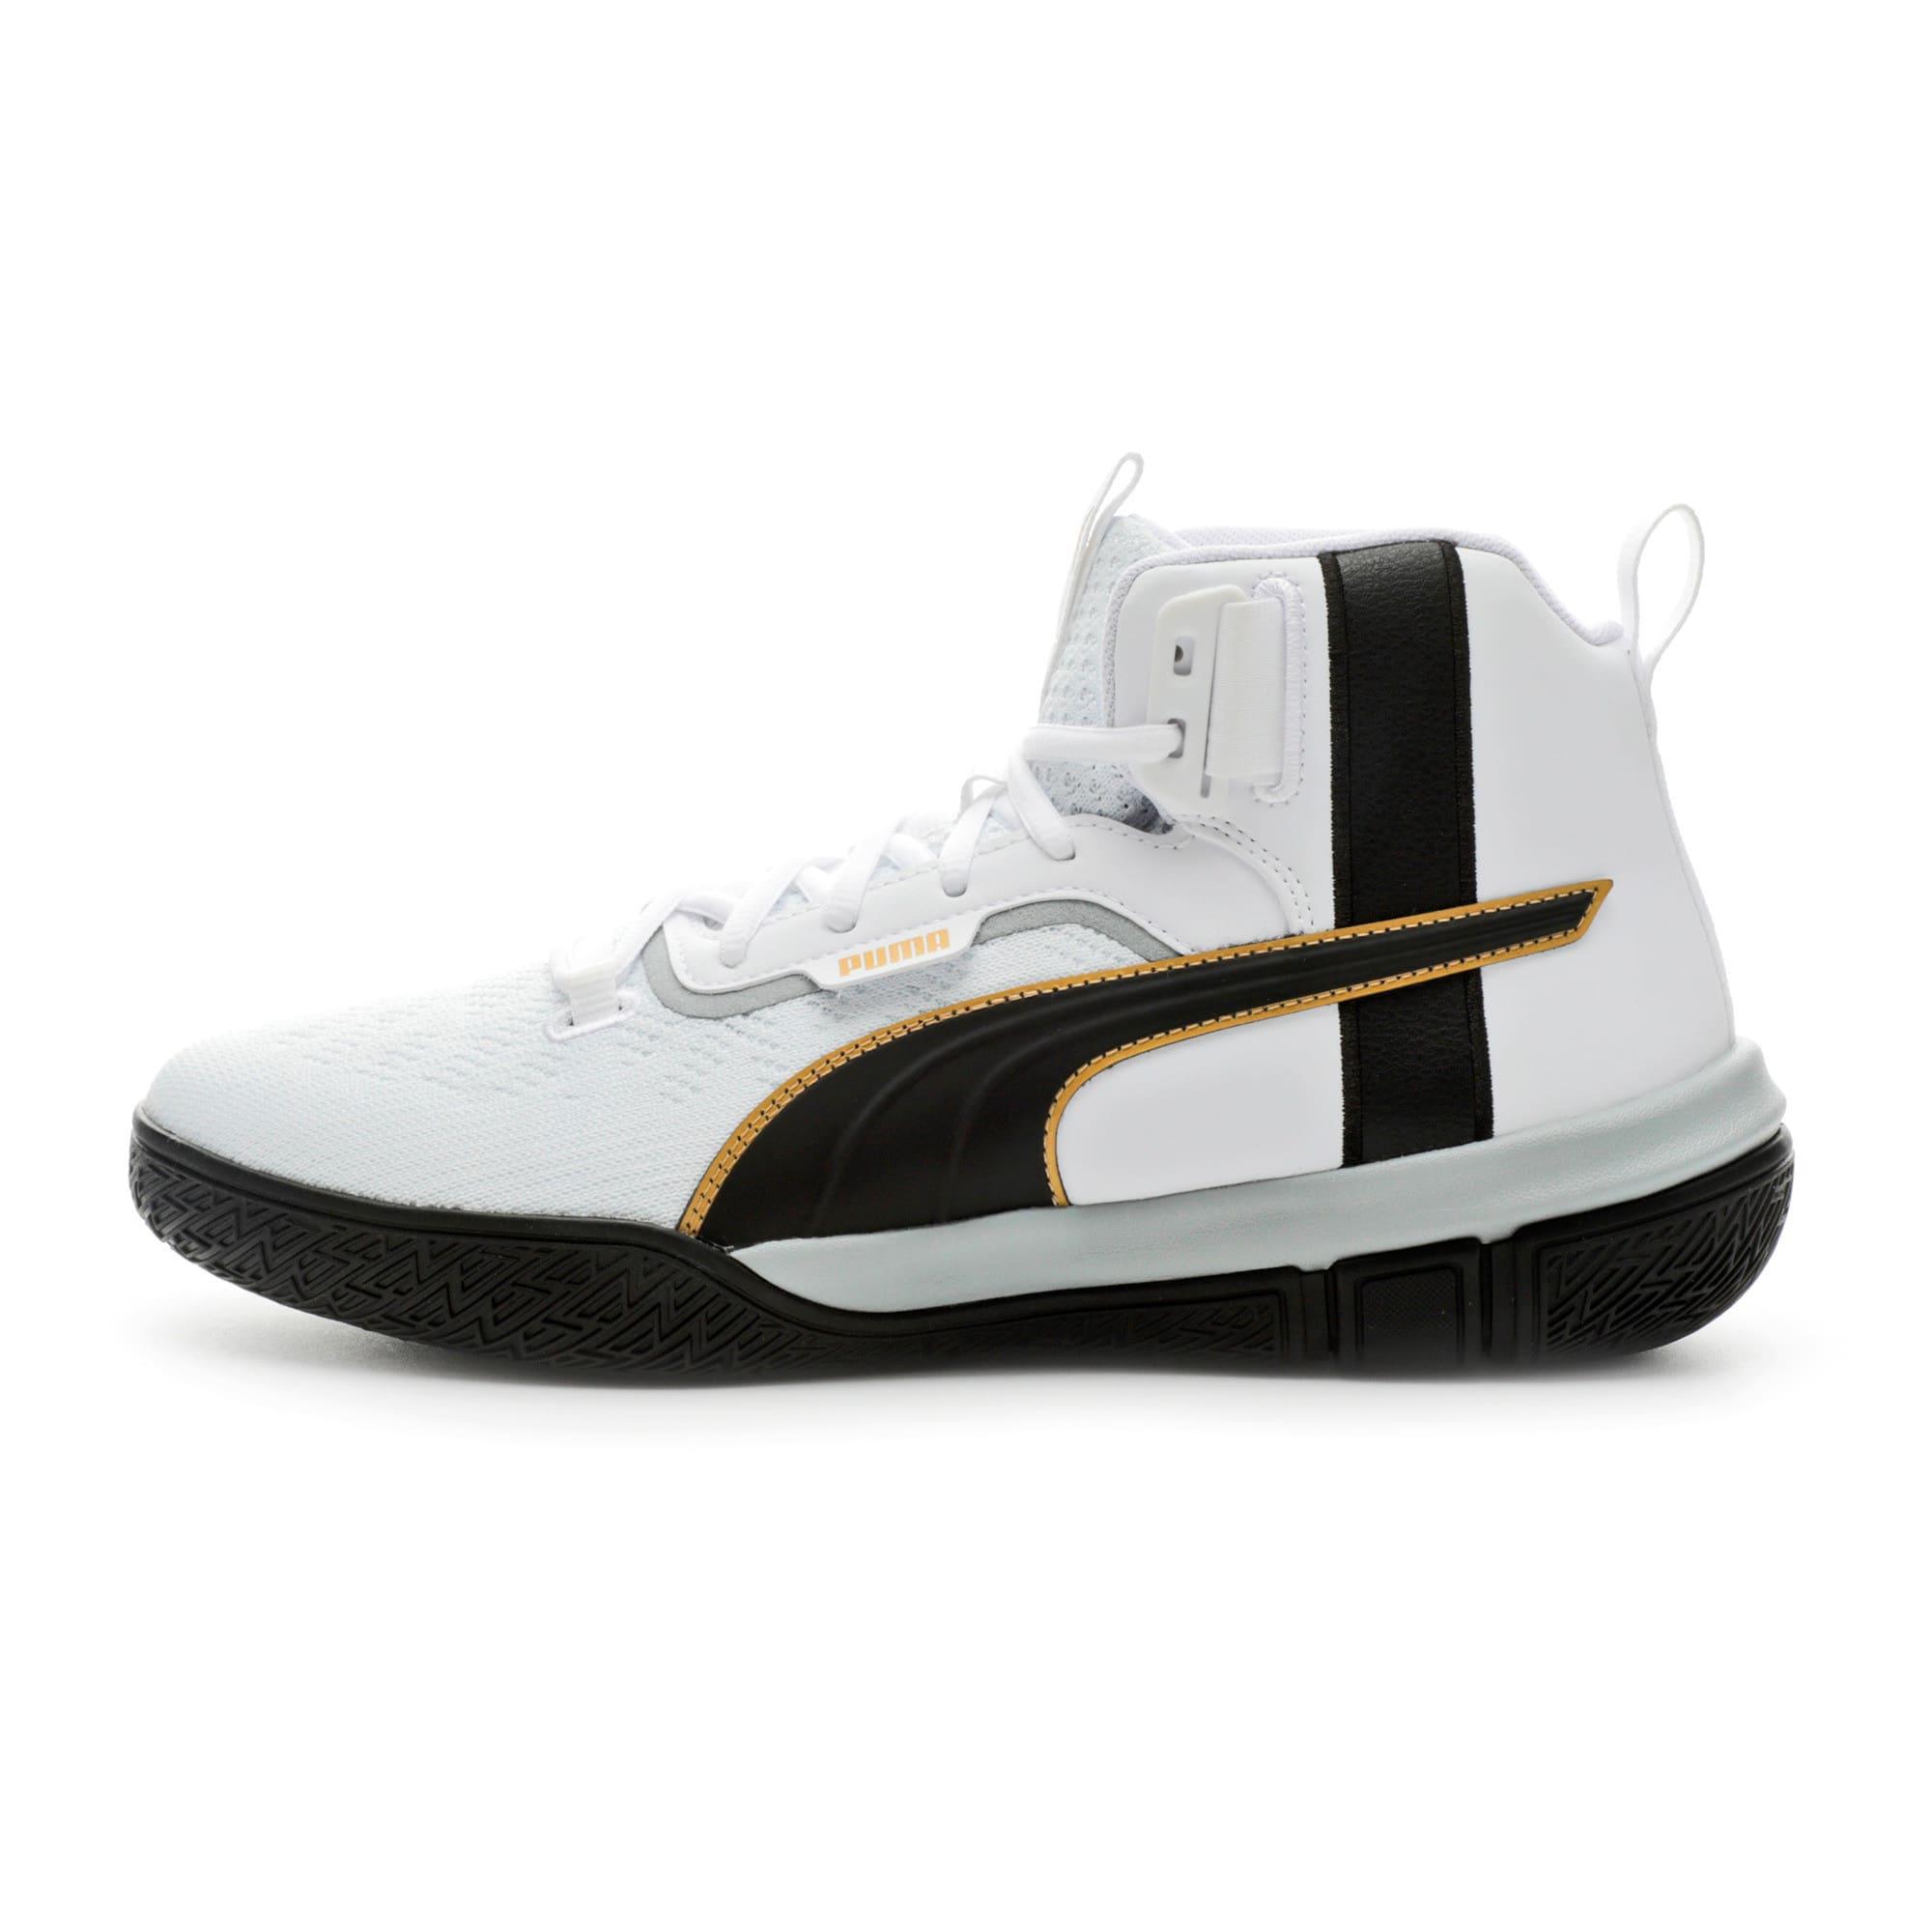 Thumbnail 1 of Legacy '68 Basketball Shoes, Puma Black-Puma White, medium-IND